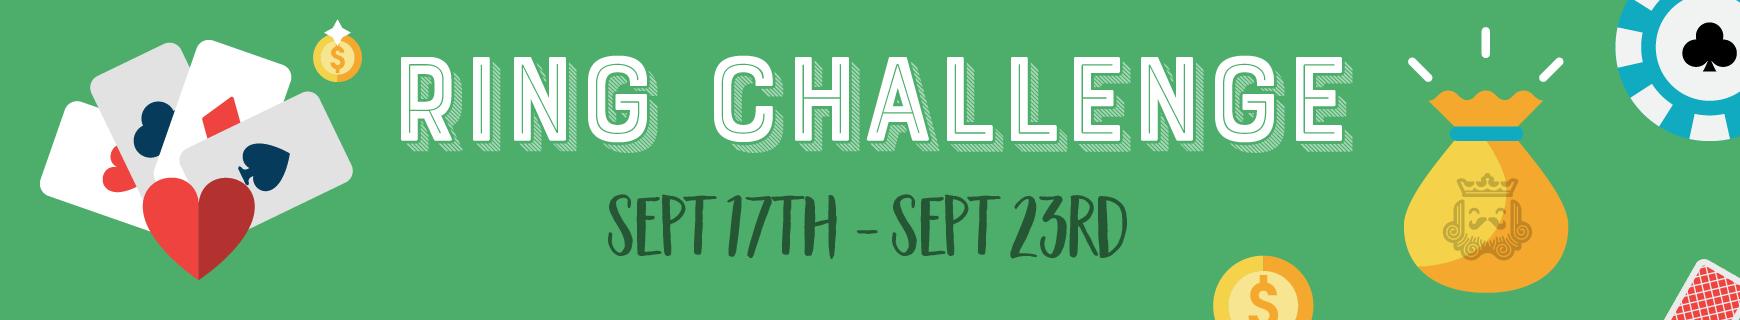 Ring challenge %28870 x 160%29 2x